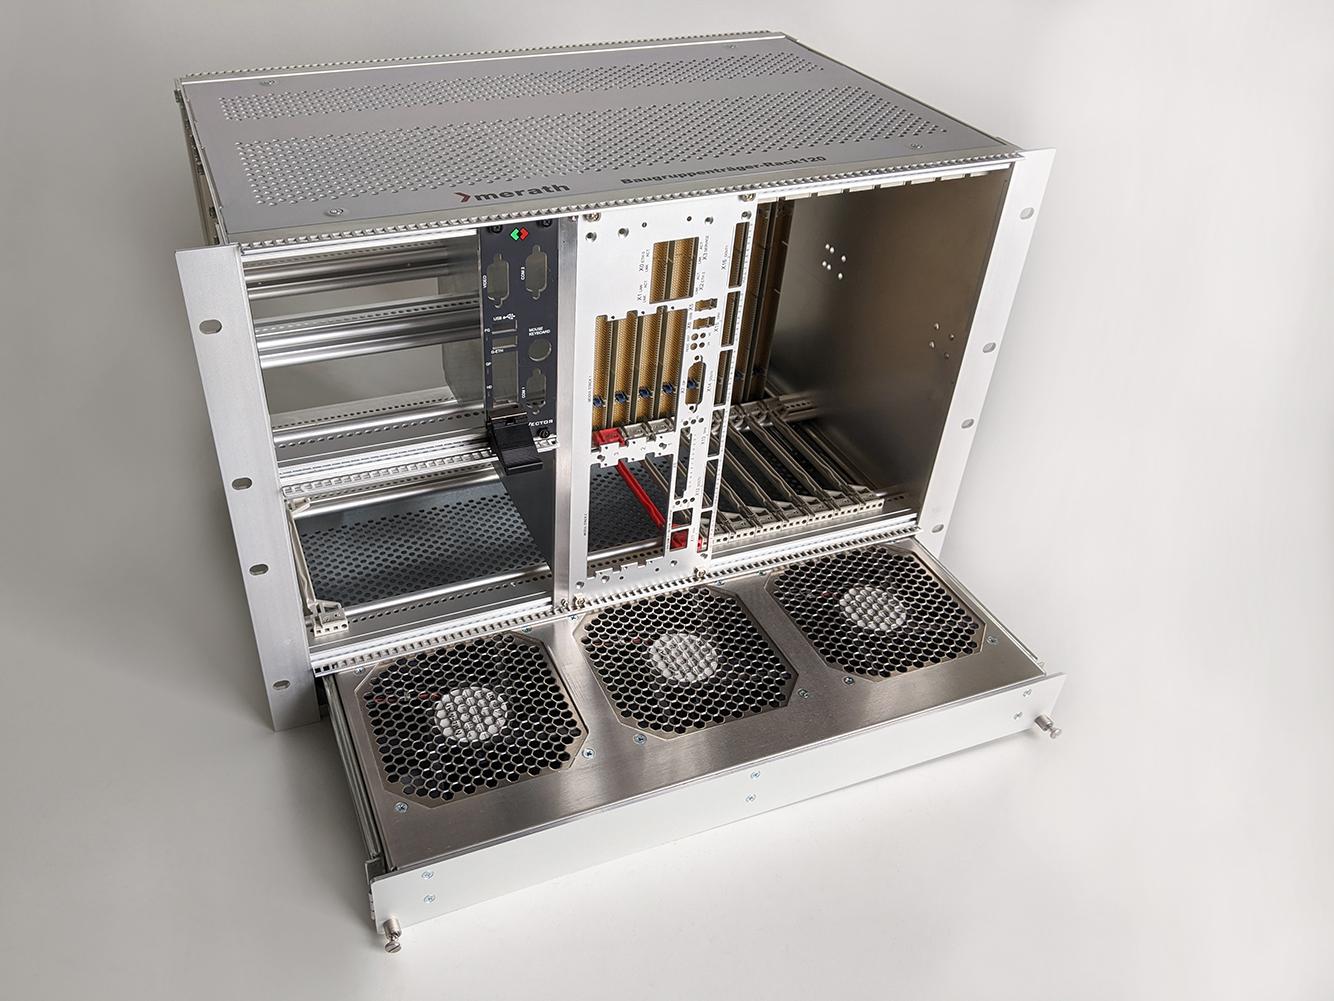 Lüftereinschub mit drei Lüftern zur Elektronikkühlung